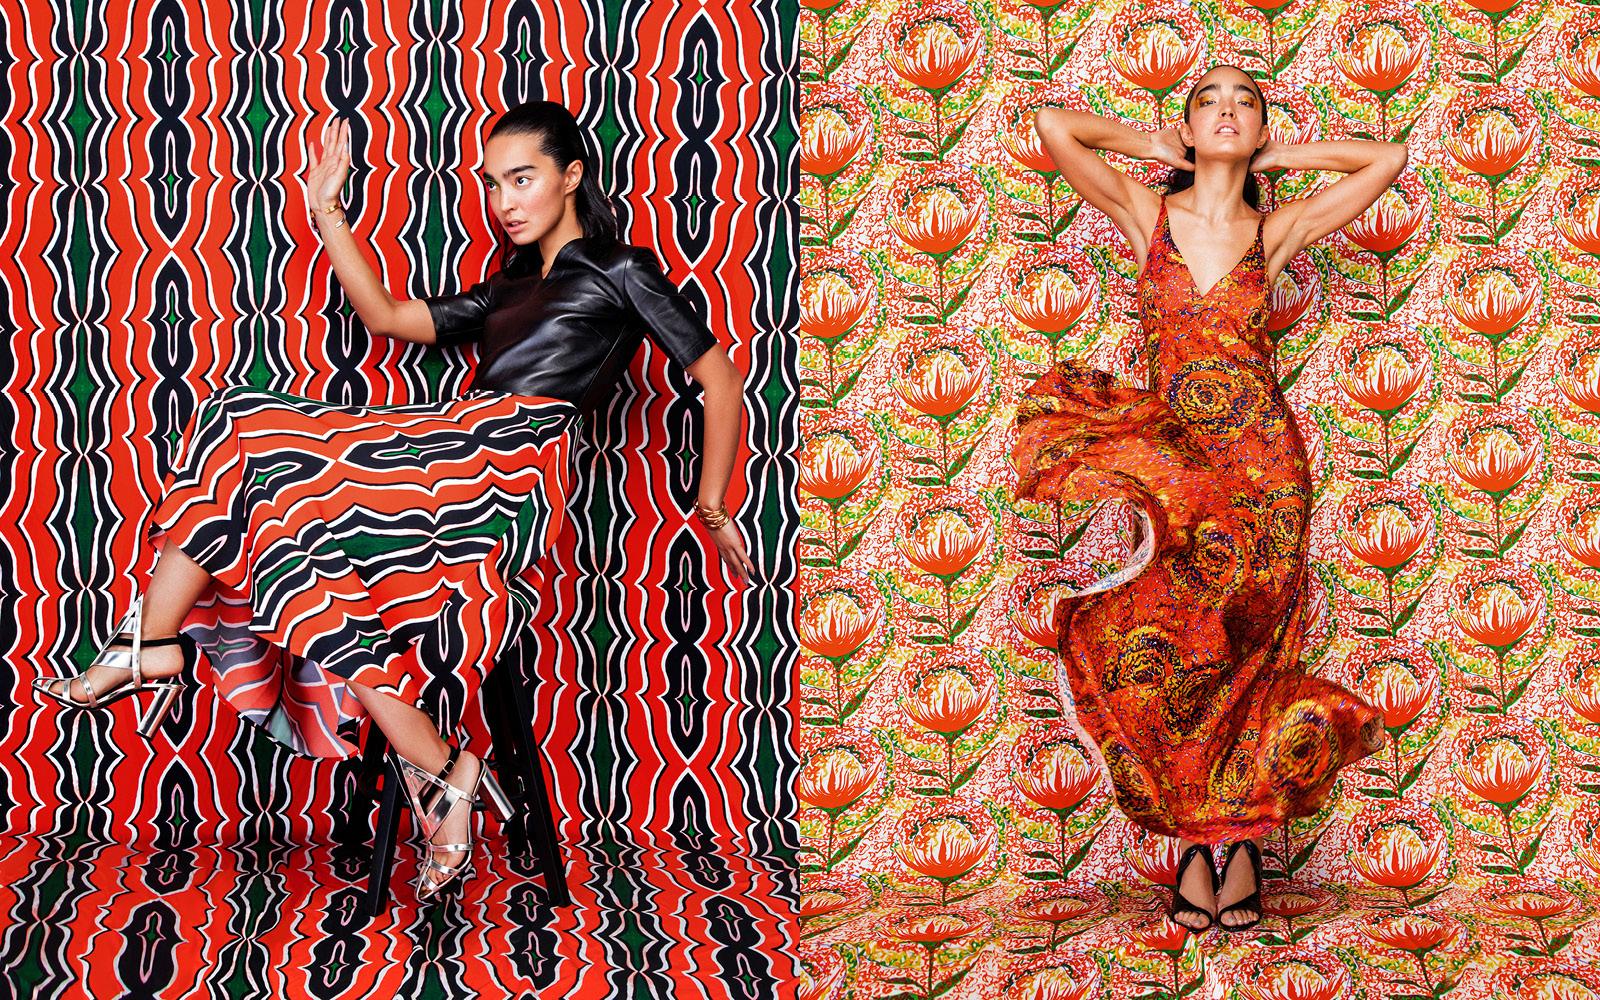 Spirit-&-Flesh-Magazine-Ayanat-Ksenbai_5